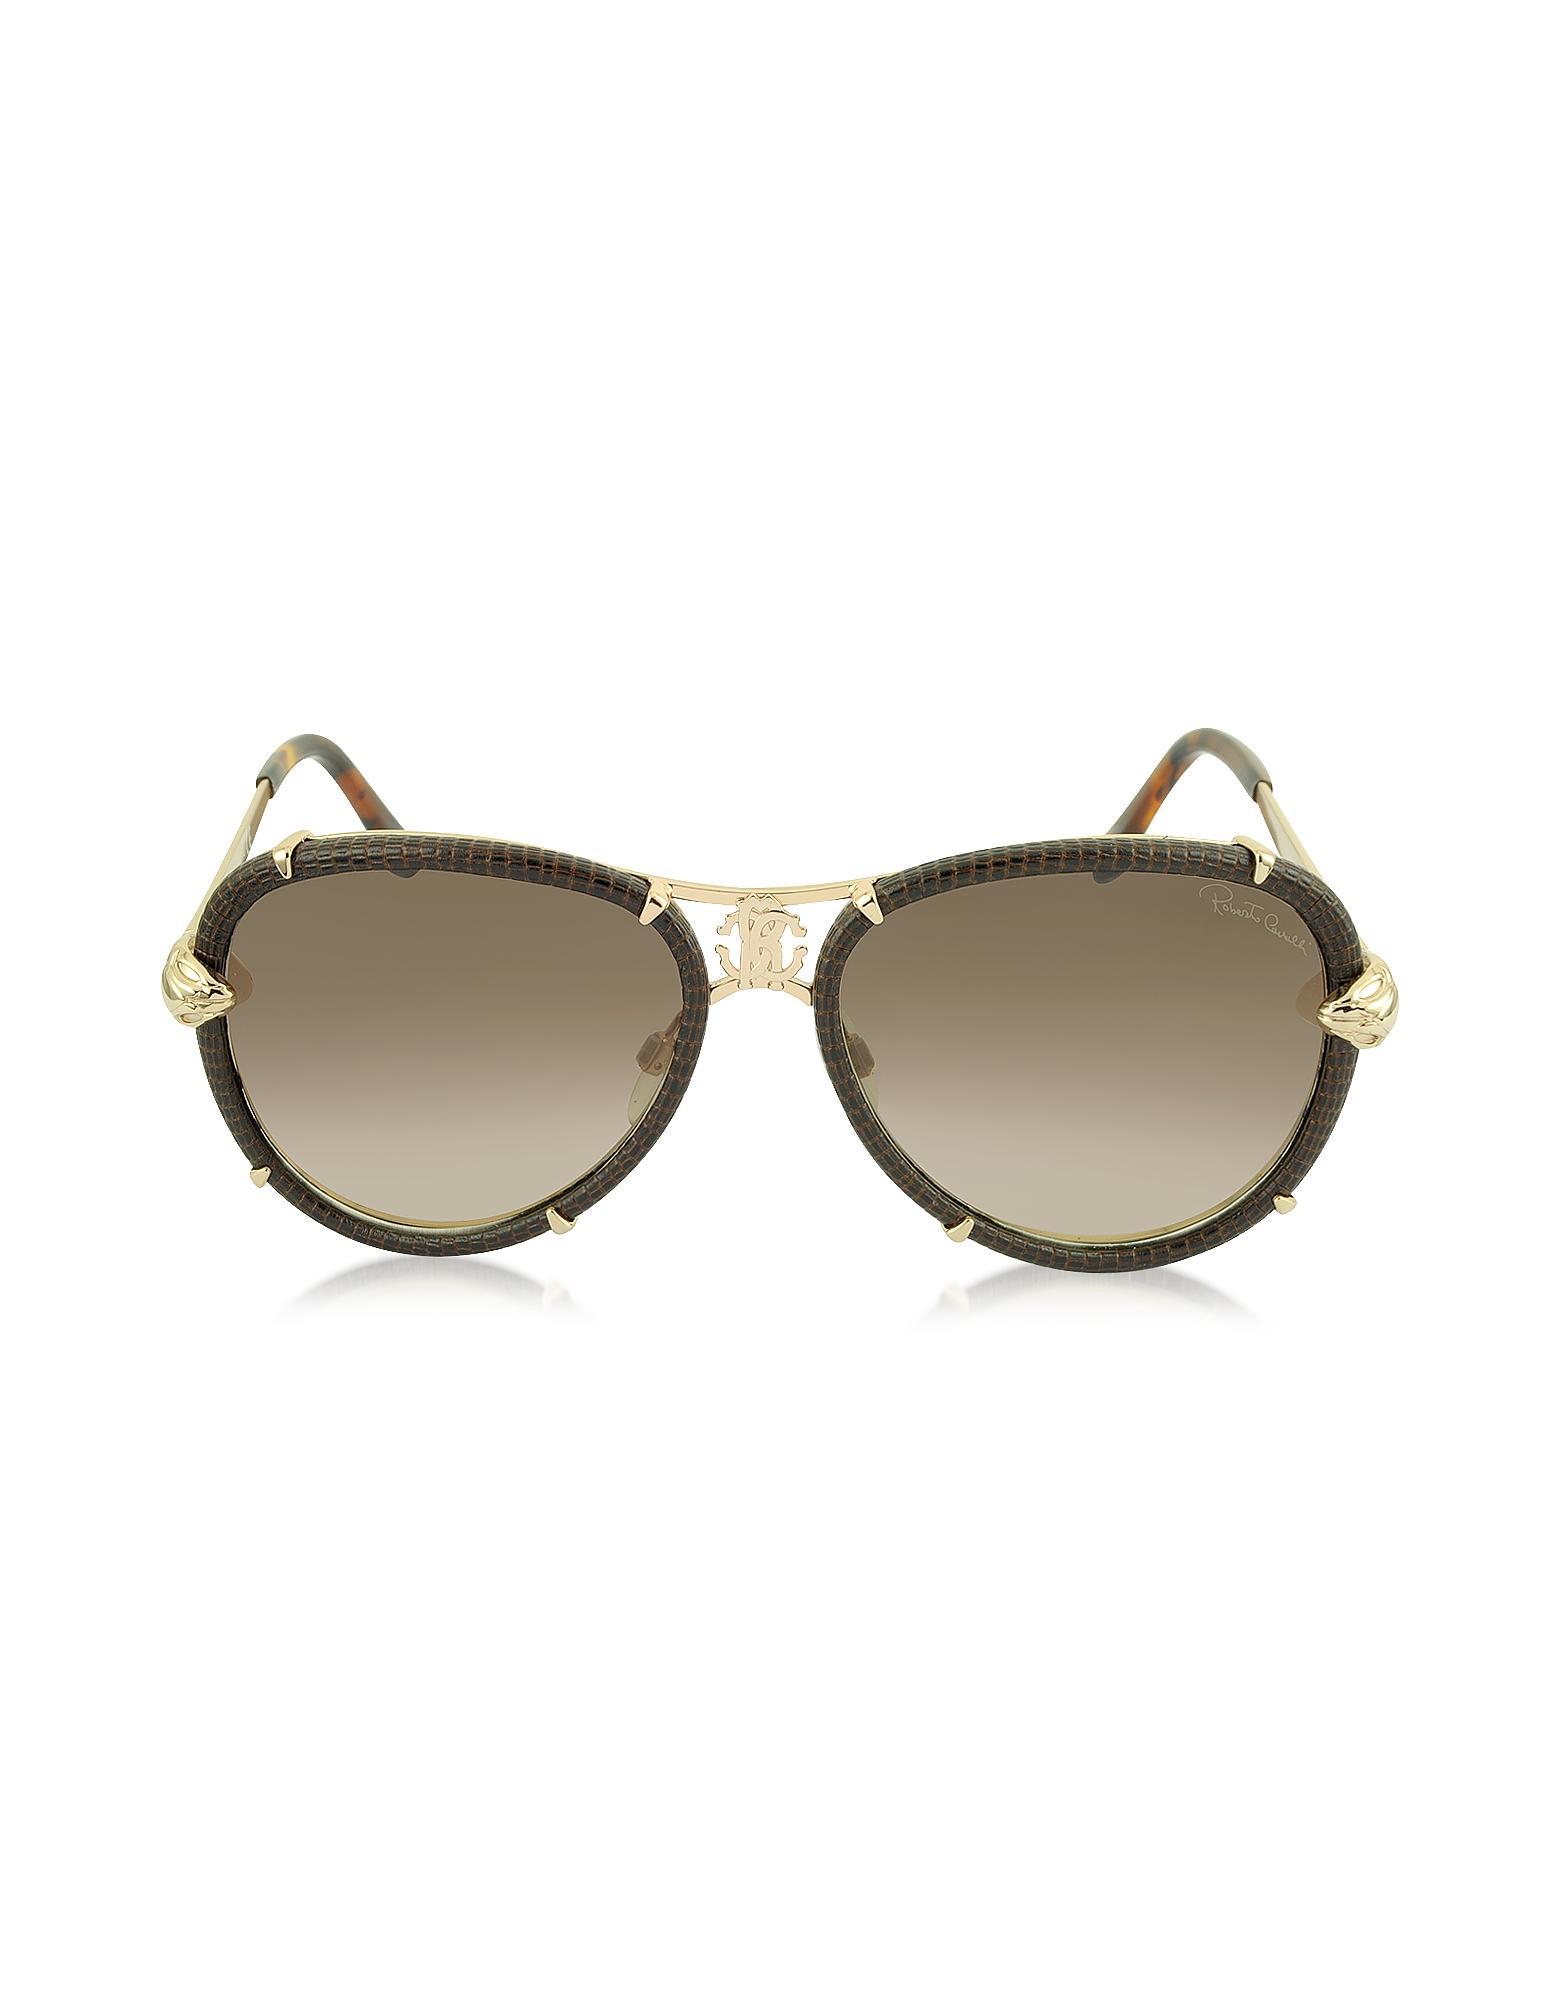 Roberto Cavalli Sunglasses, Mebsuta 885S Leather & Gold Metal Aviator Sunglasses